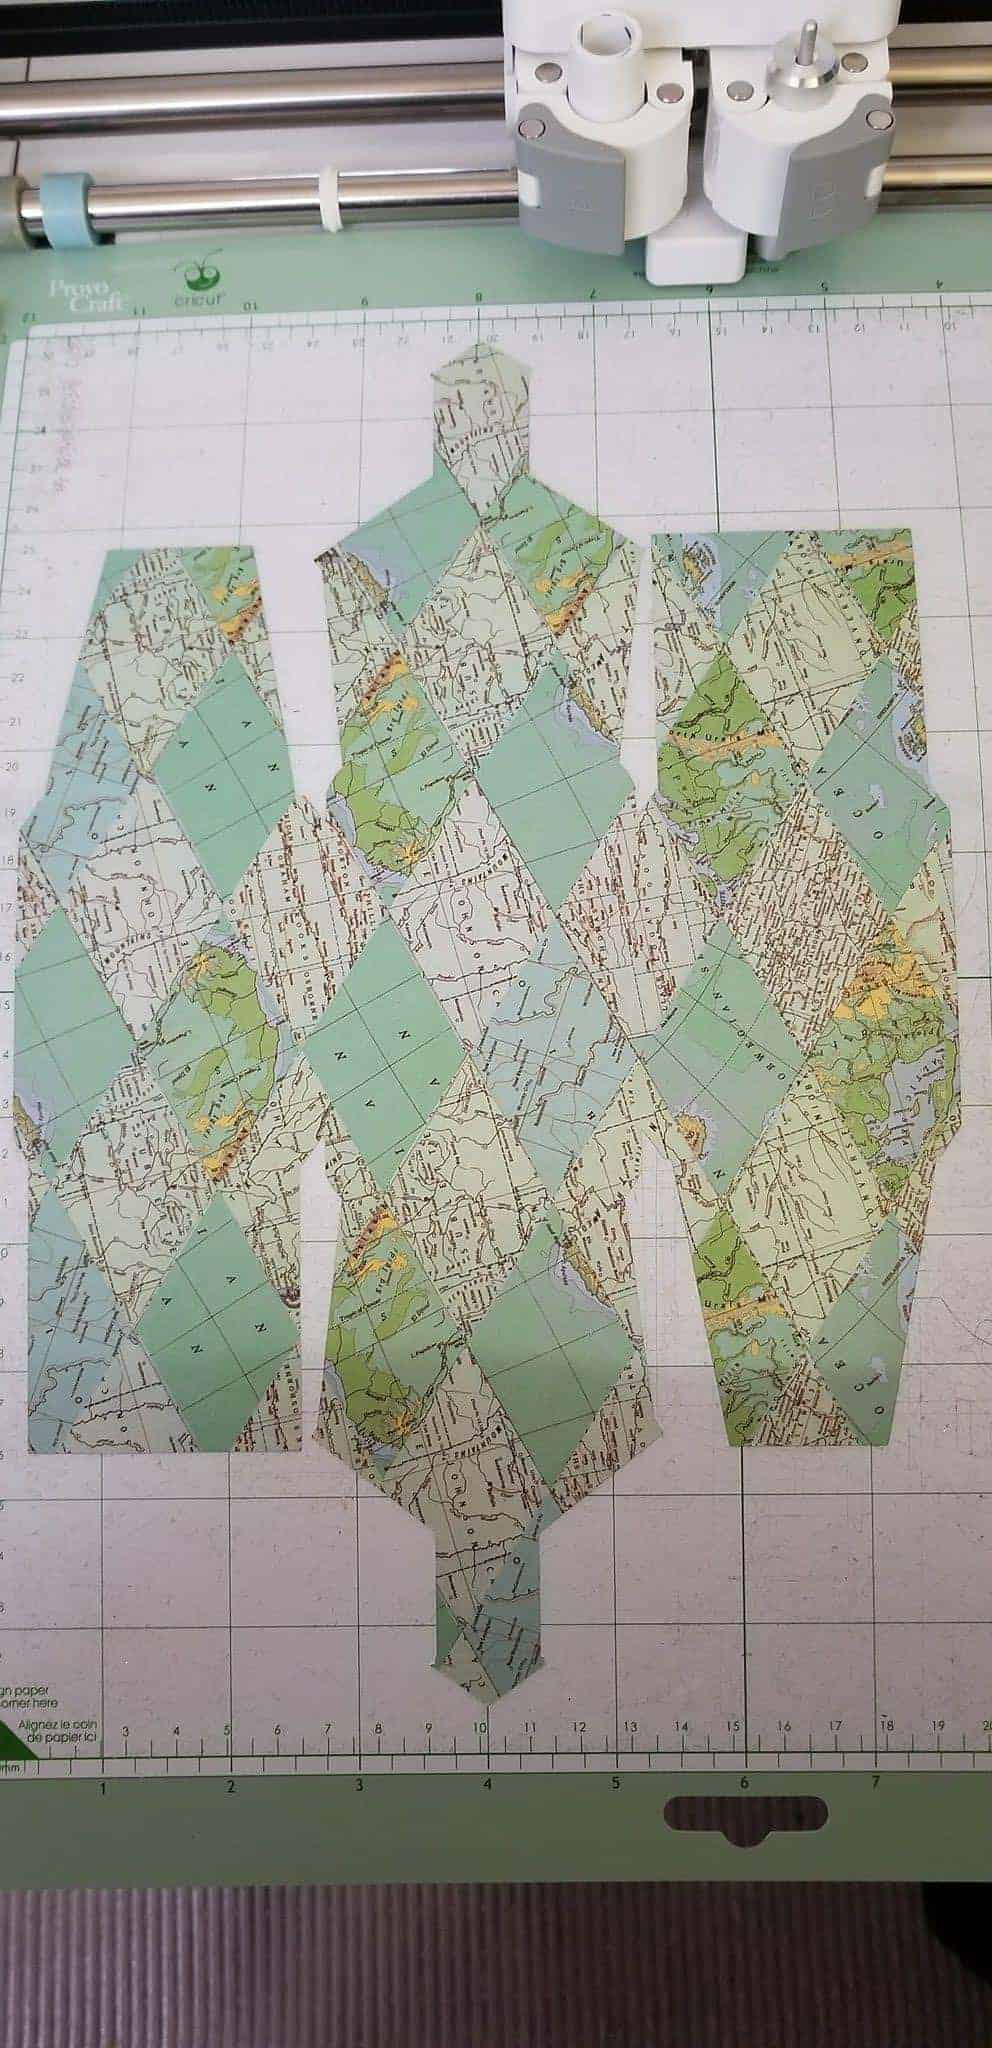 Teacher Appreciation Gift Ideas how-to - map print schoolhouse cutout made with cricut